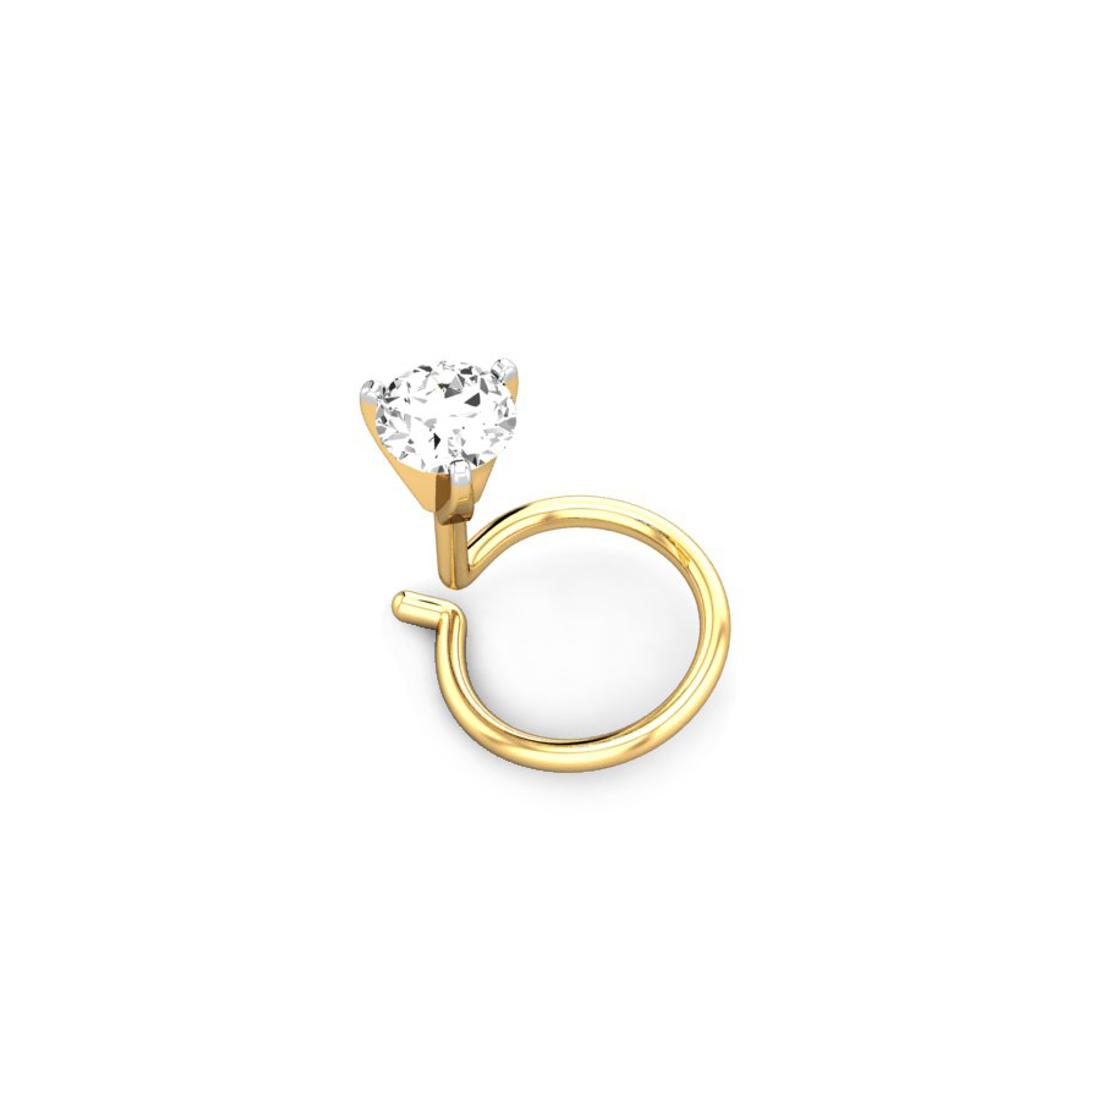 Jewel samarth 18k(750)Yellow Gold and 0.10 ct.(IGI Certified Diamonds) Nose pin